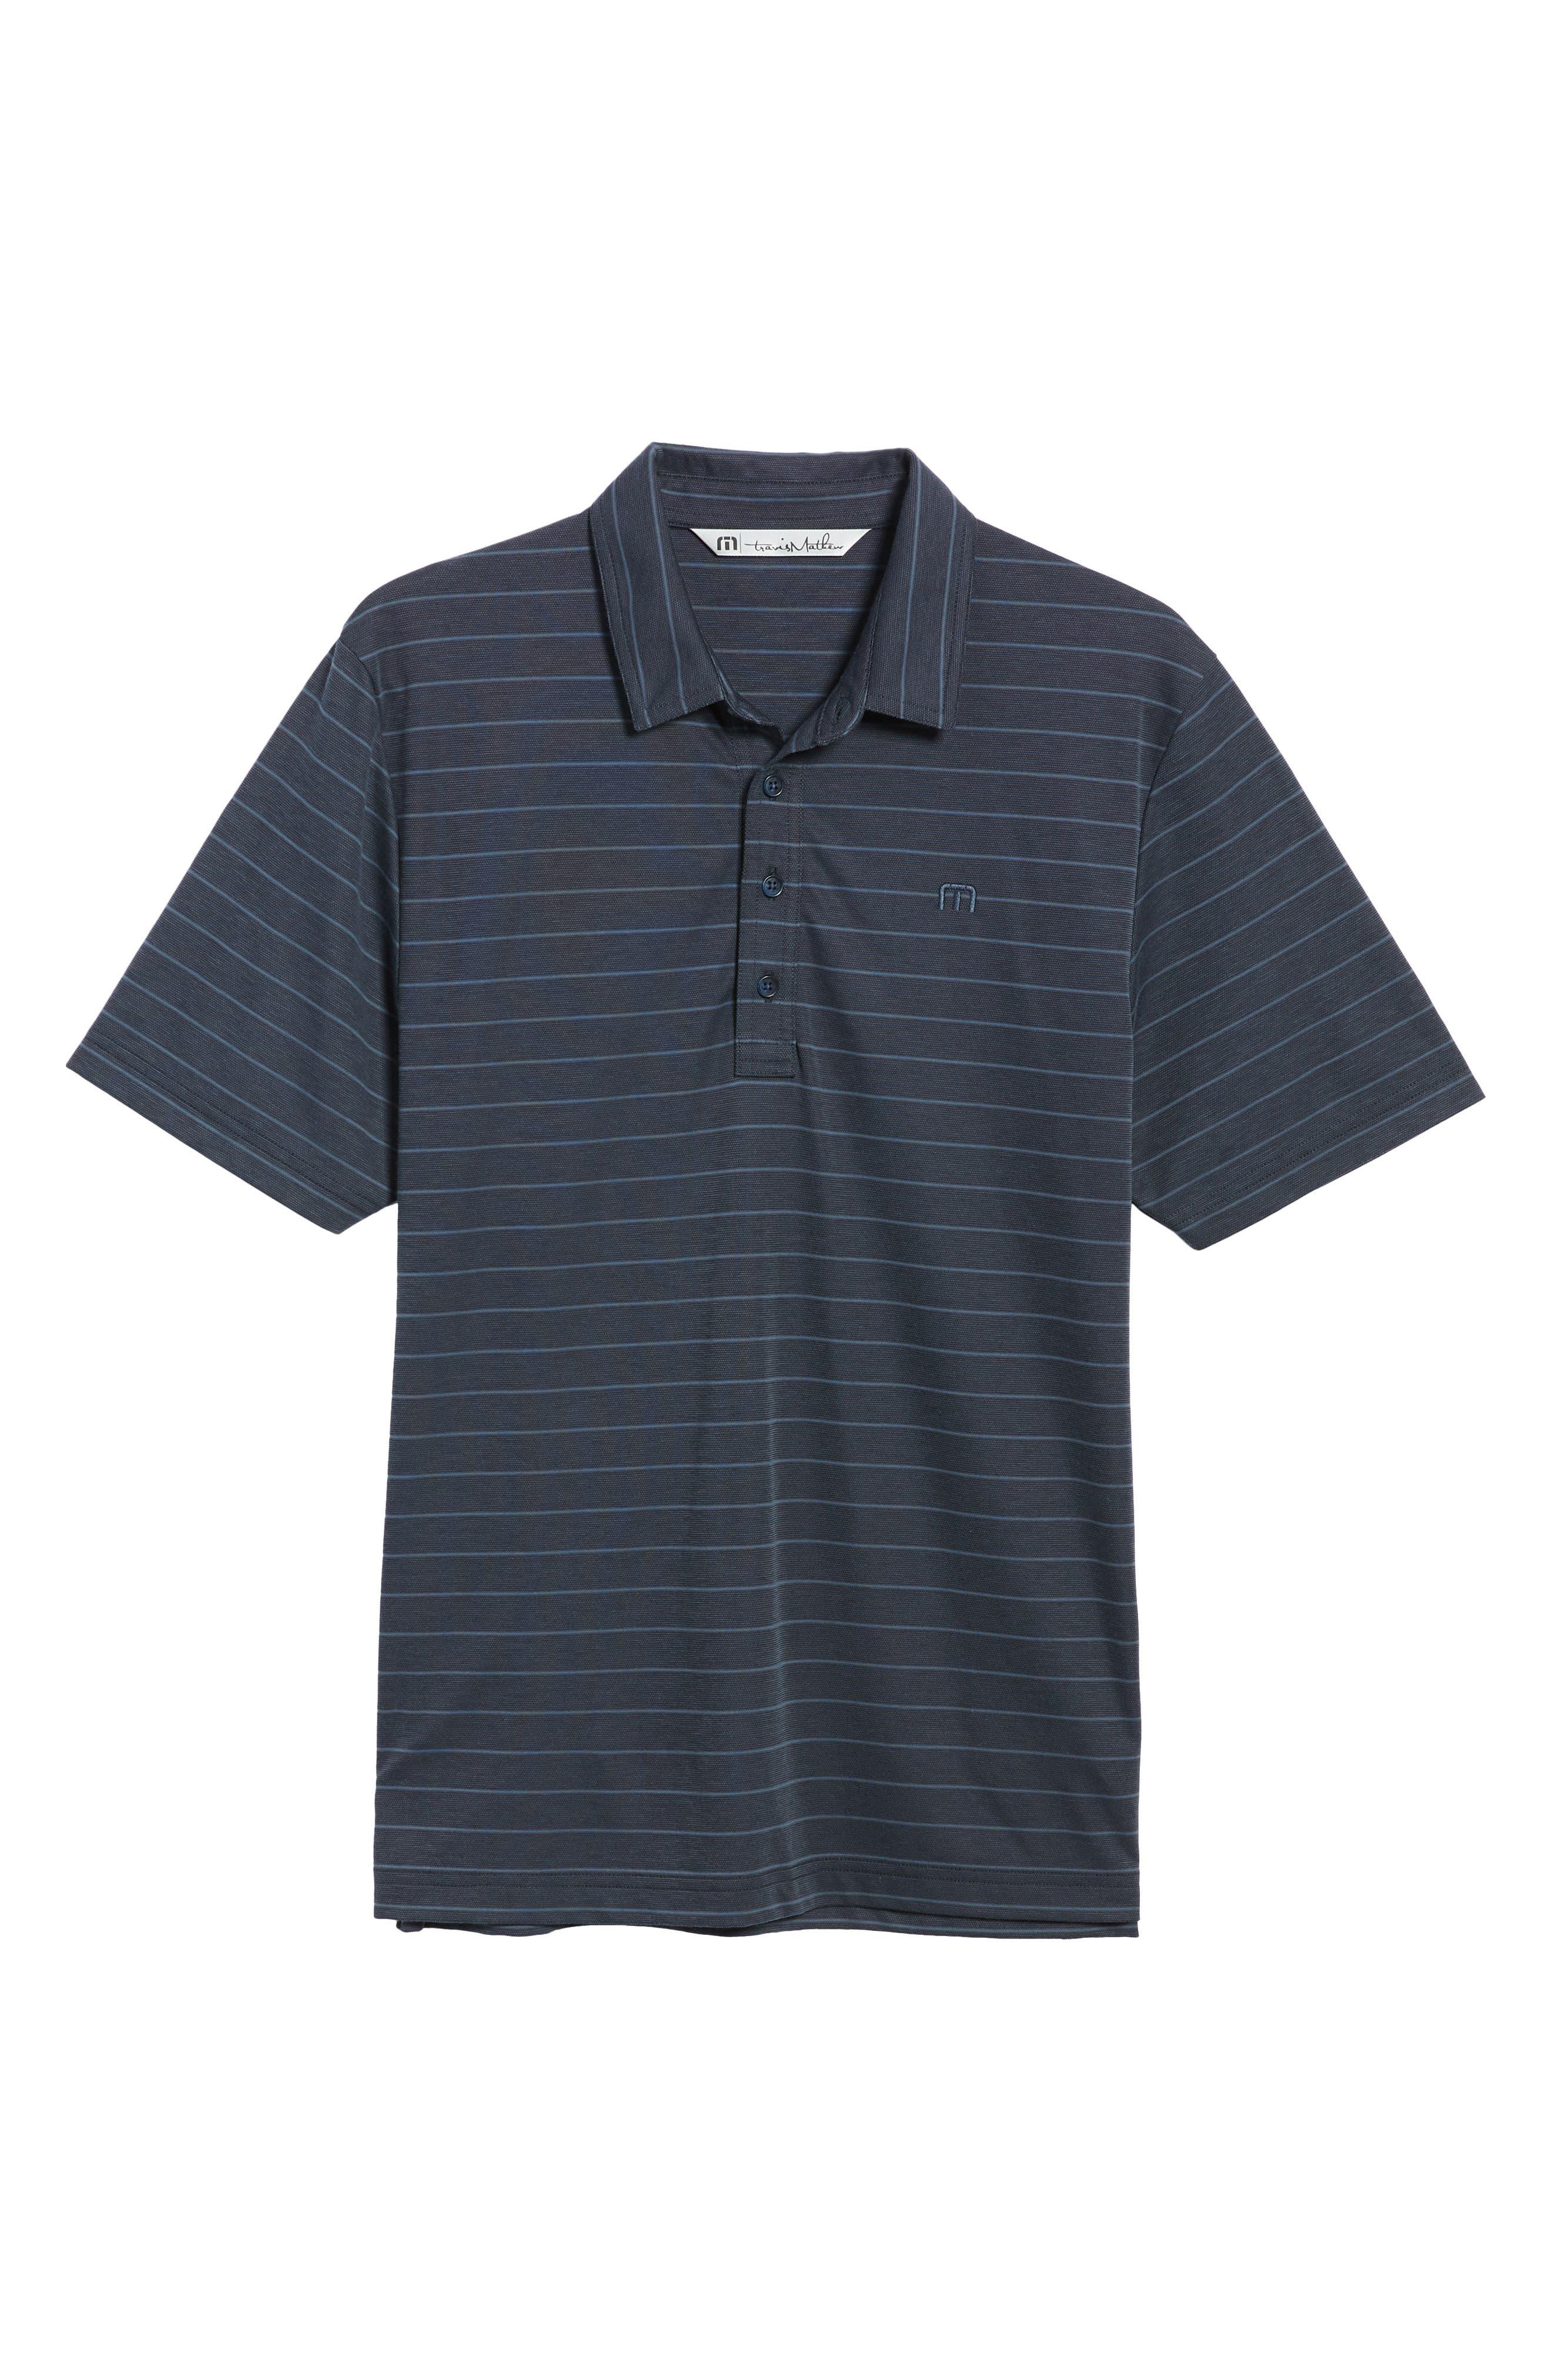 Marini Polo Shirt,                             Alternate thumbnail 6, color,                             BLUE NIGHTS/ ALLURE